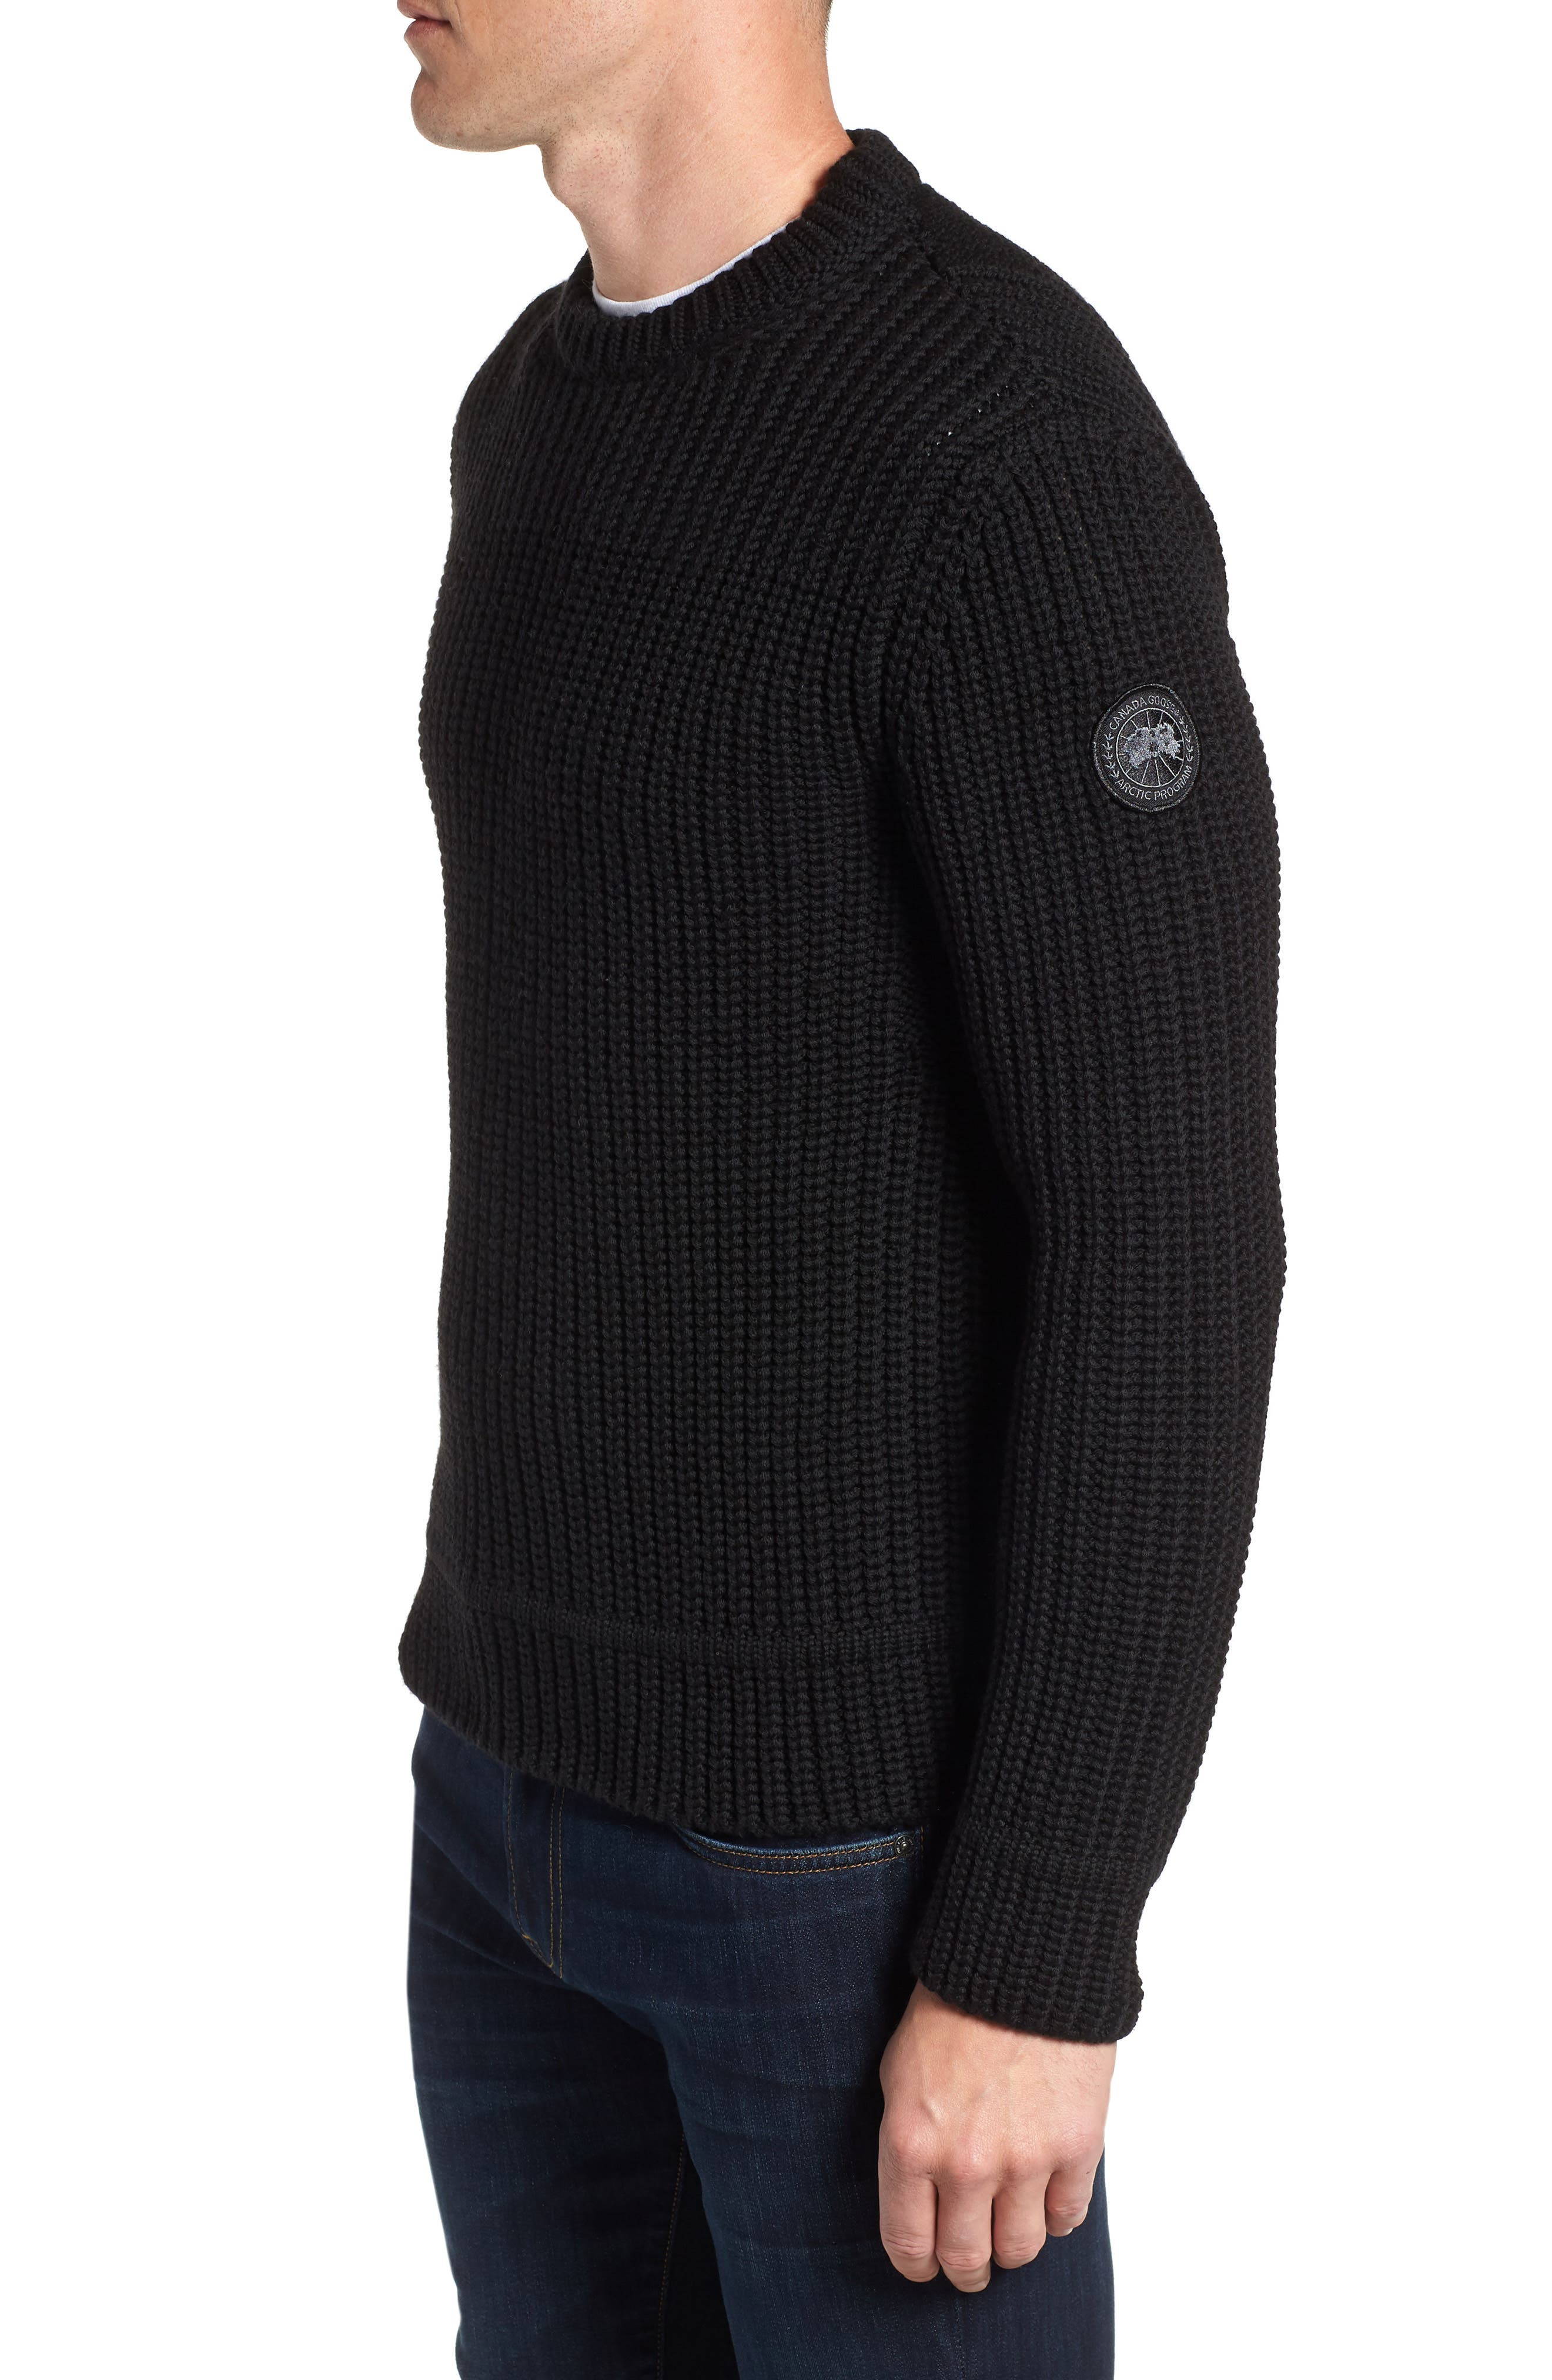 Galloway Regular Fit Merino Wool Sweater,                             Alternate thumbnail 3, color,                             BLACK